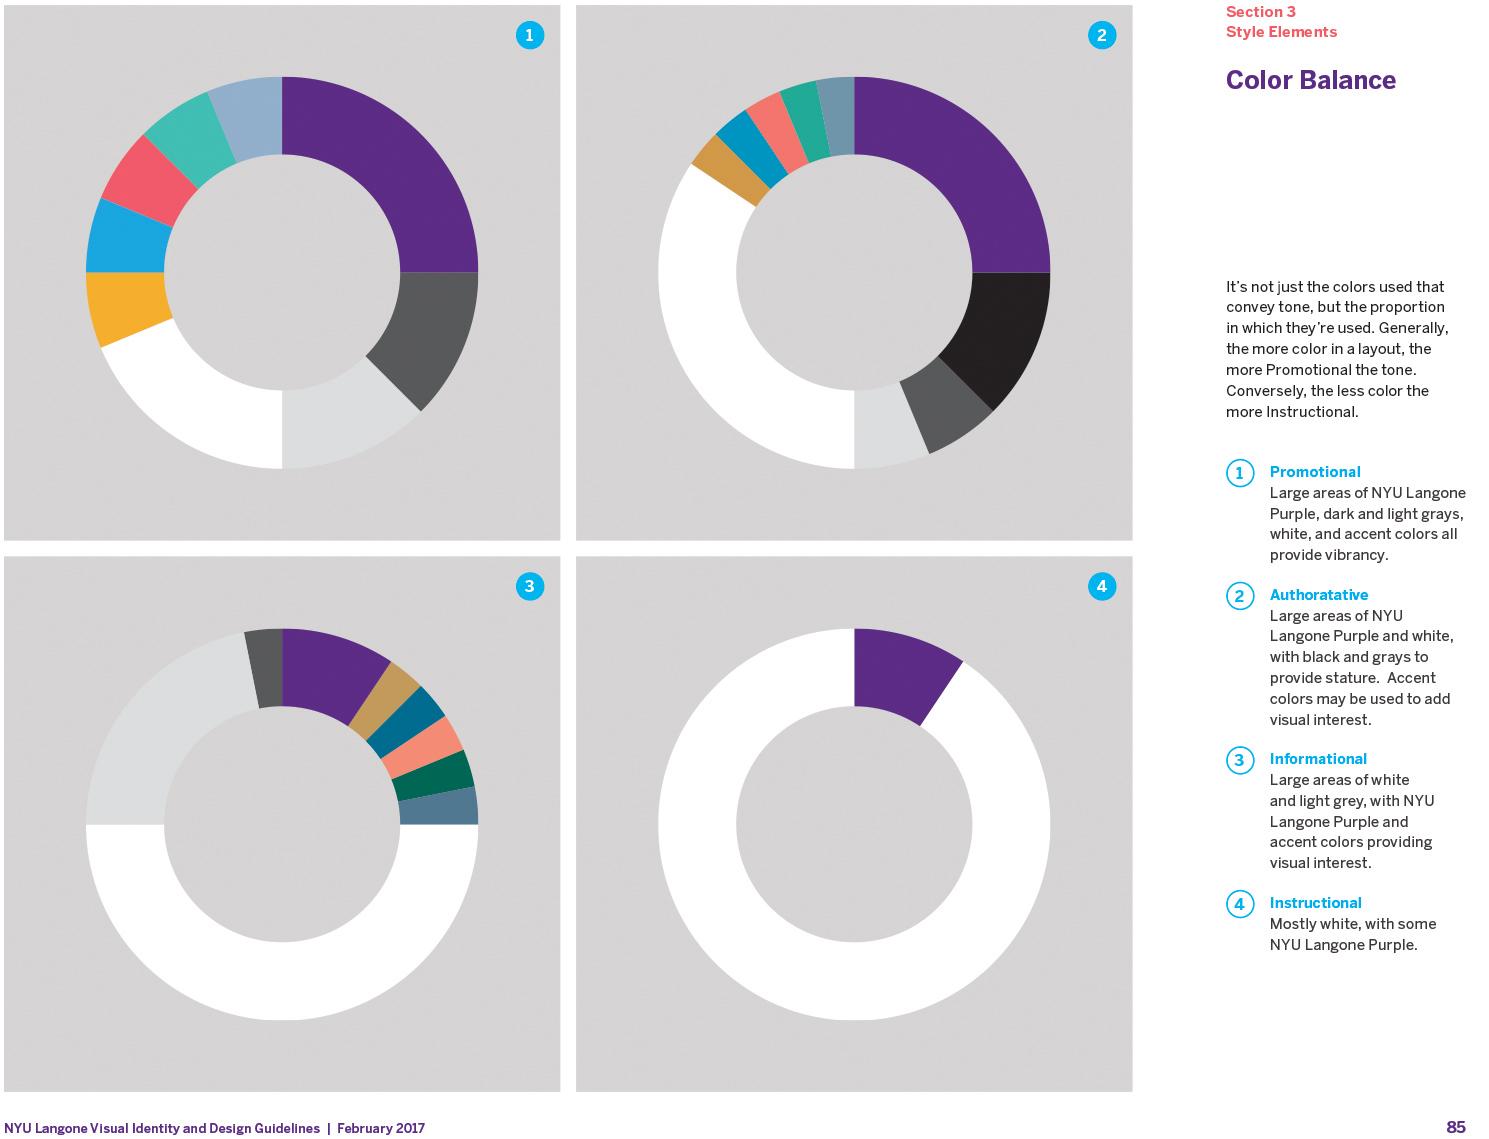 NYU_Guidelines_color_balance_page.jpg